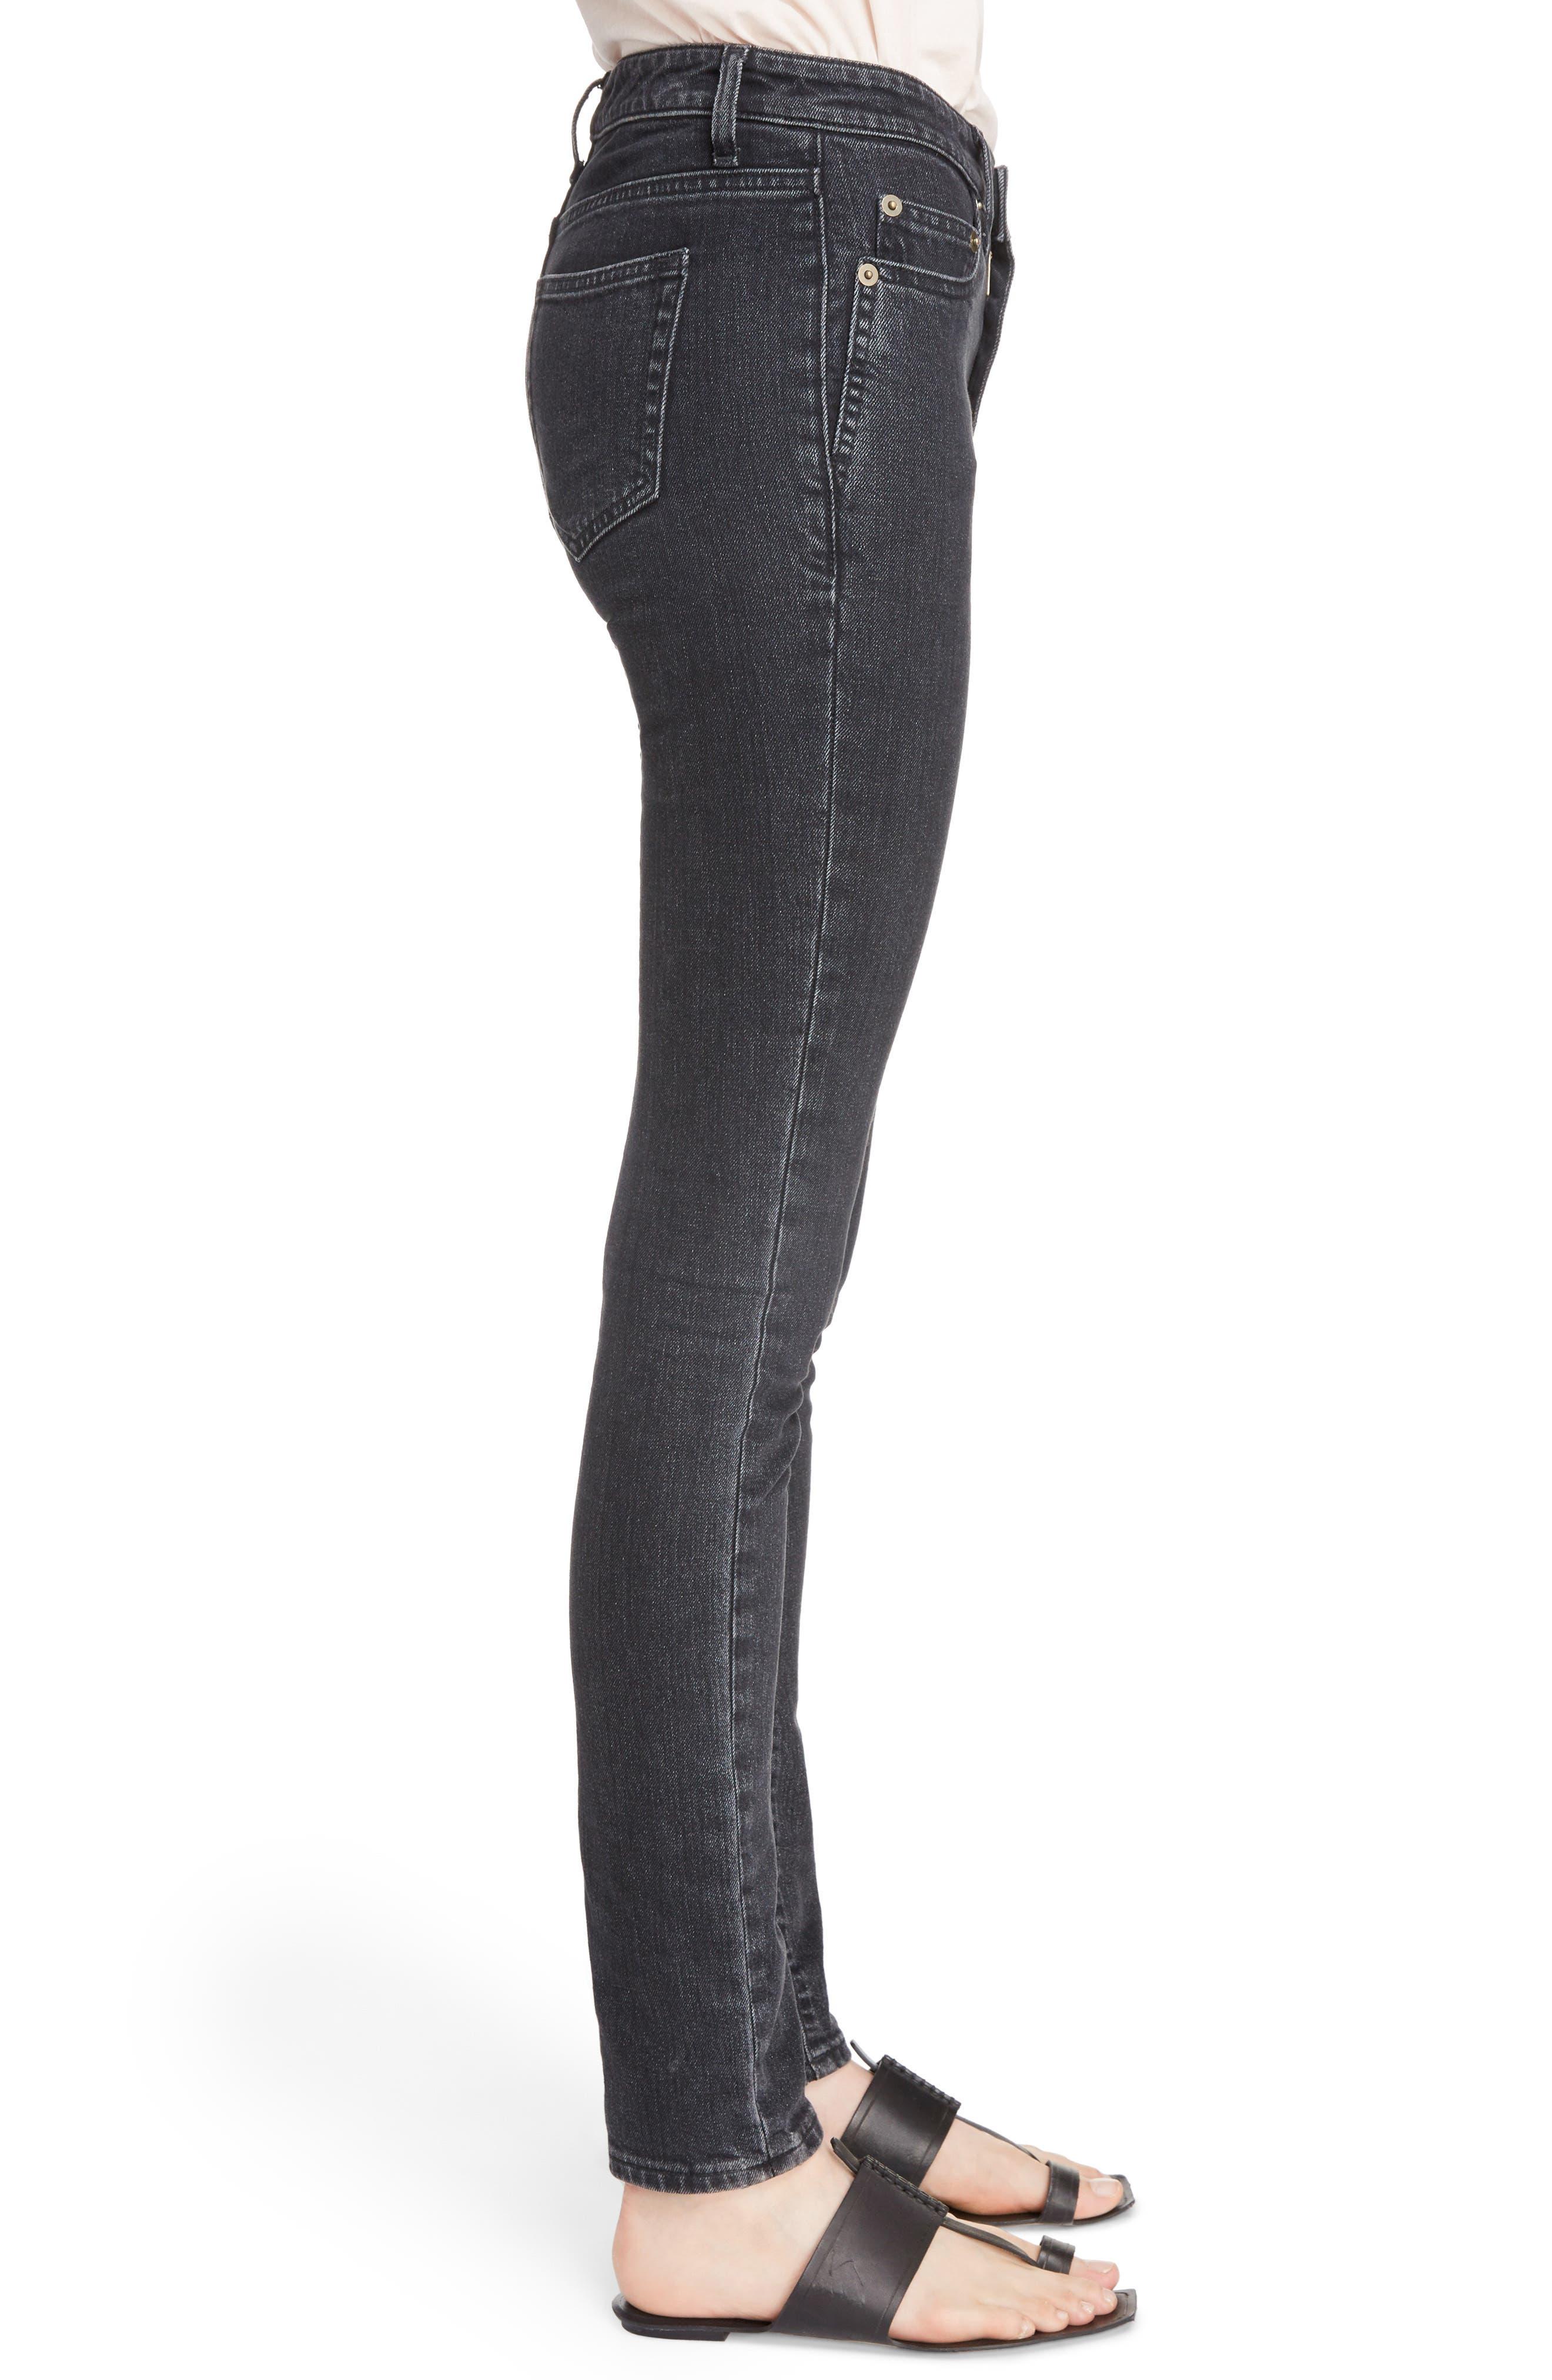 Skinny Stretch Jeans,                             Alternate thumbnail 3, color,                             Black Stonewash